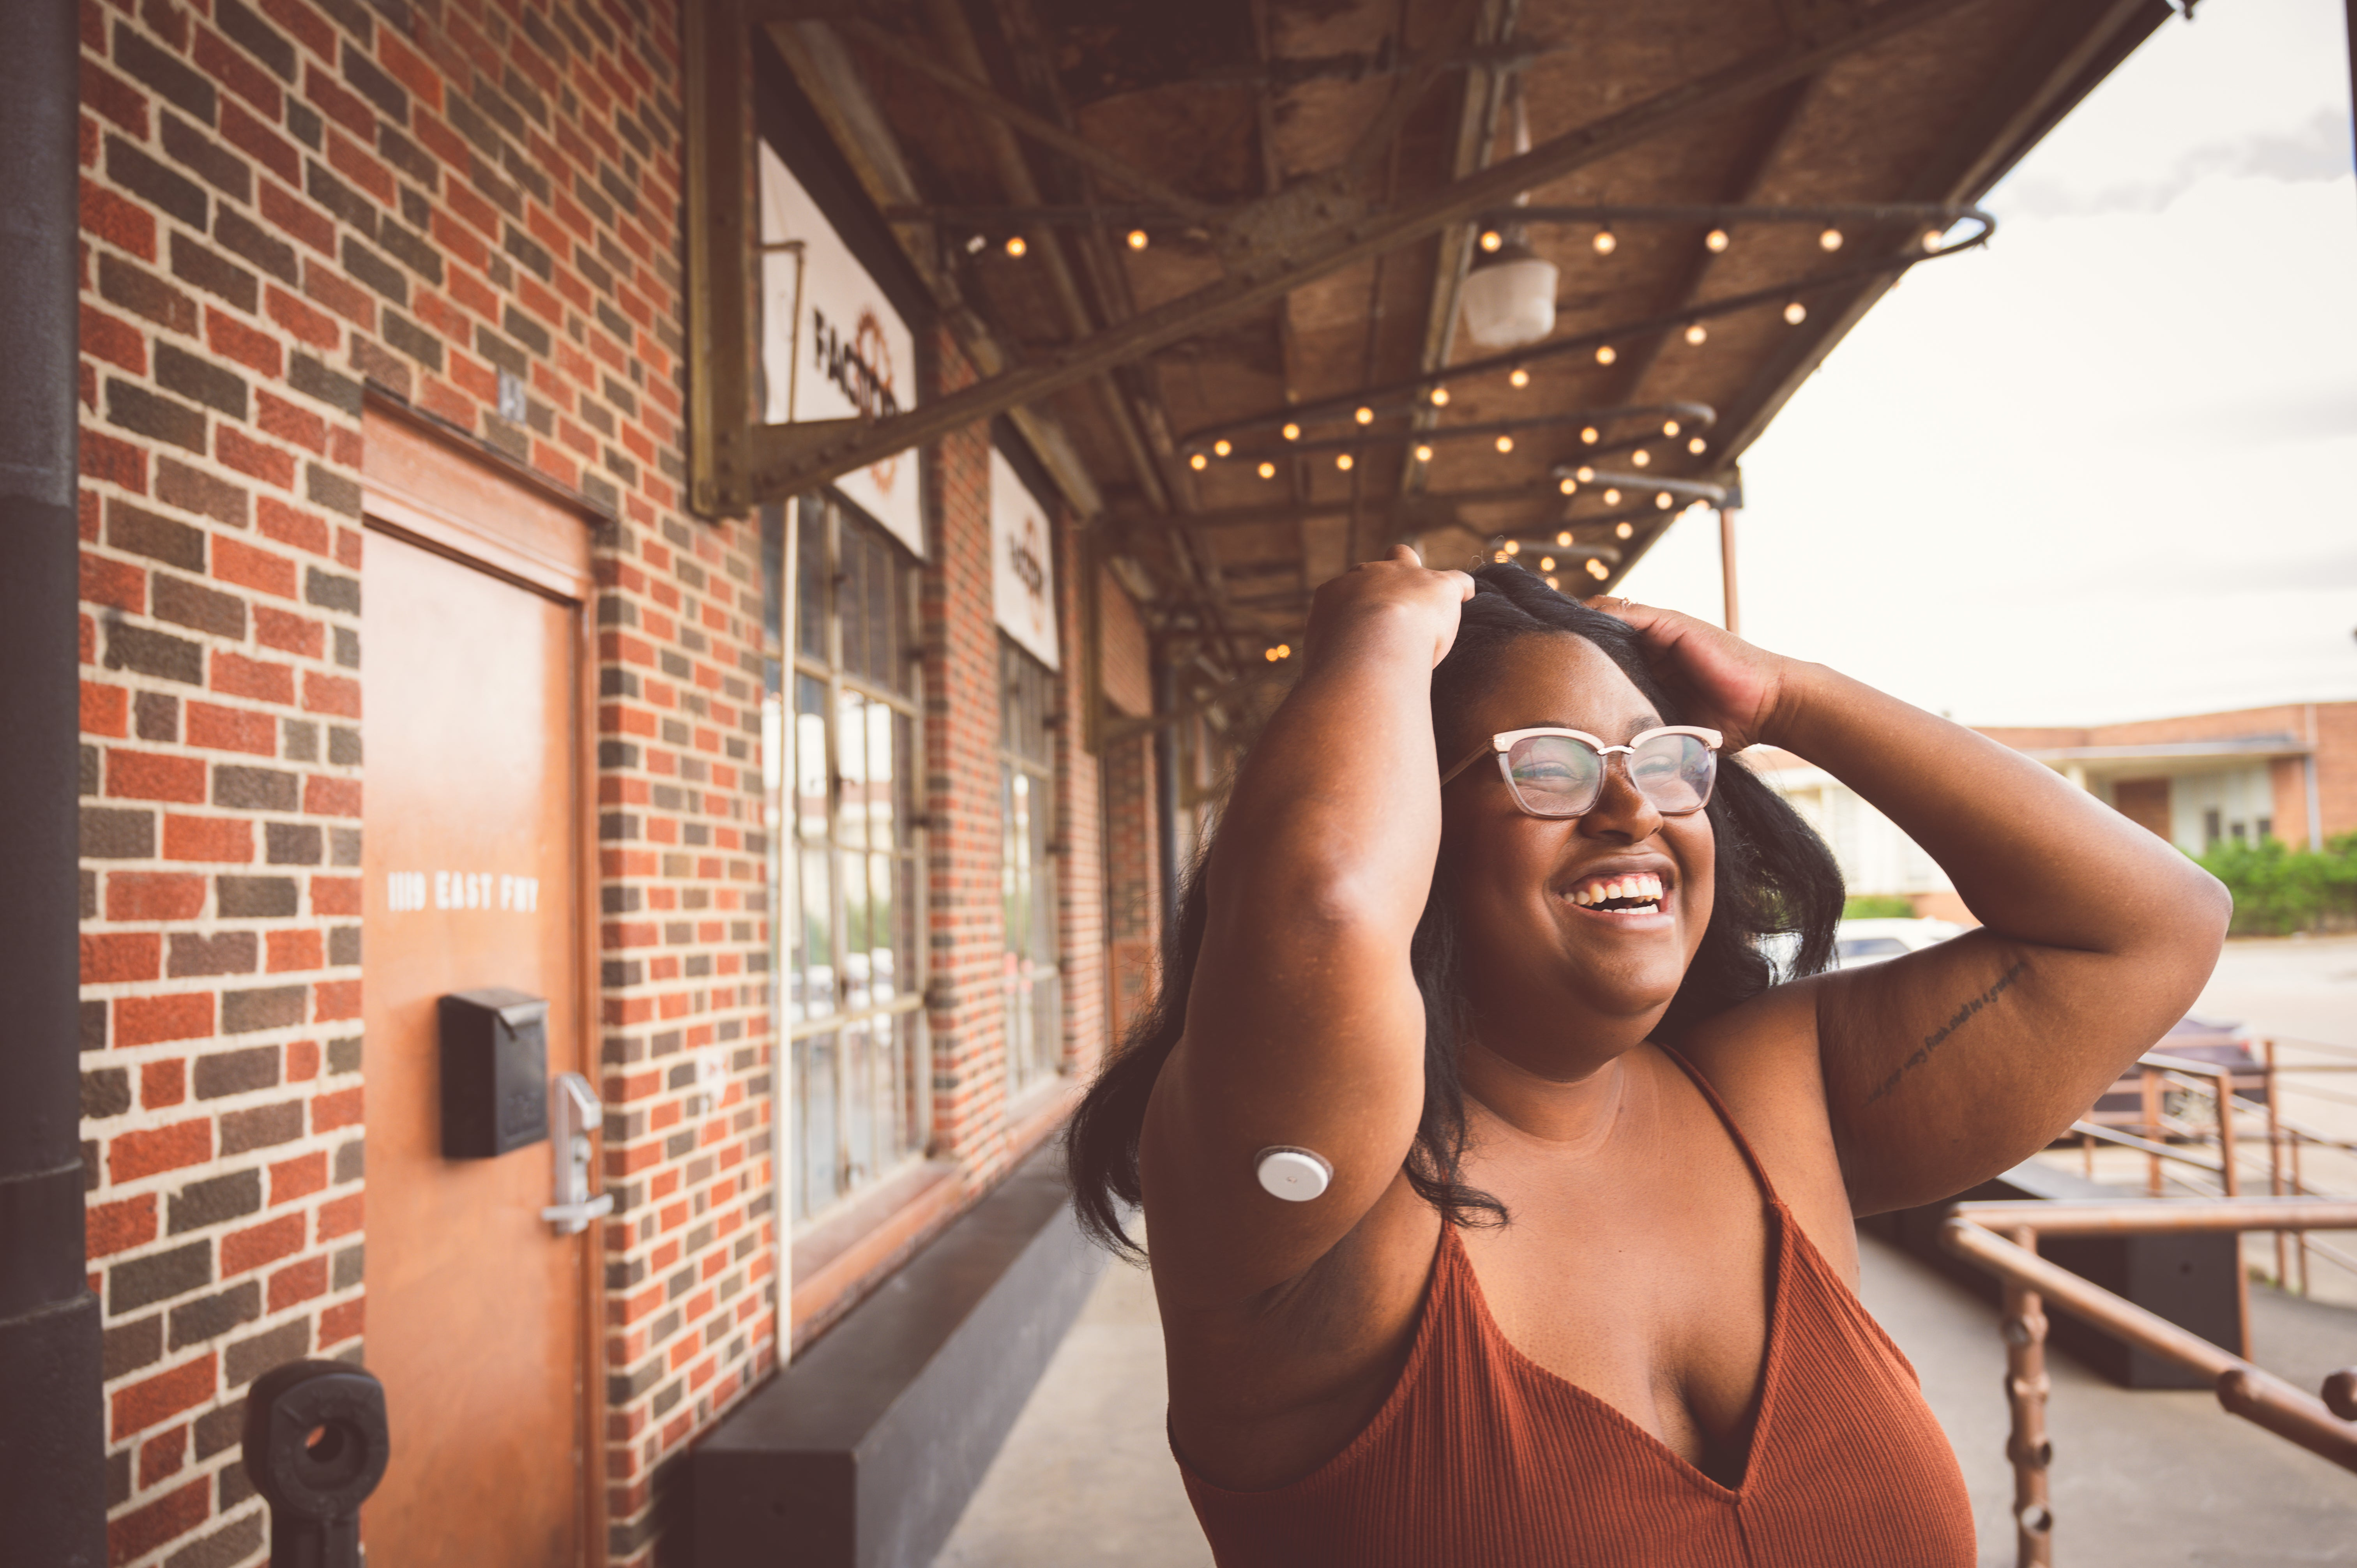 Meet the Changemakers: Mila Buckley of Hangry Woman